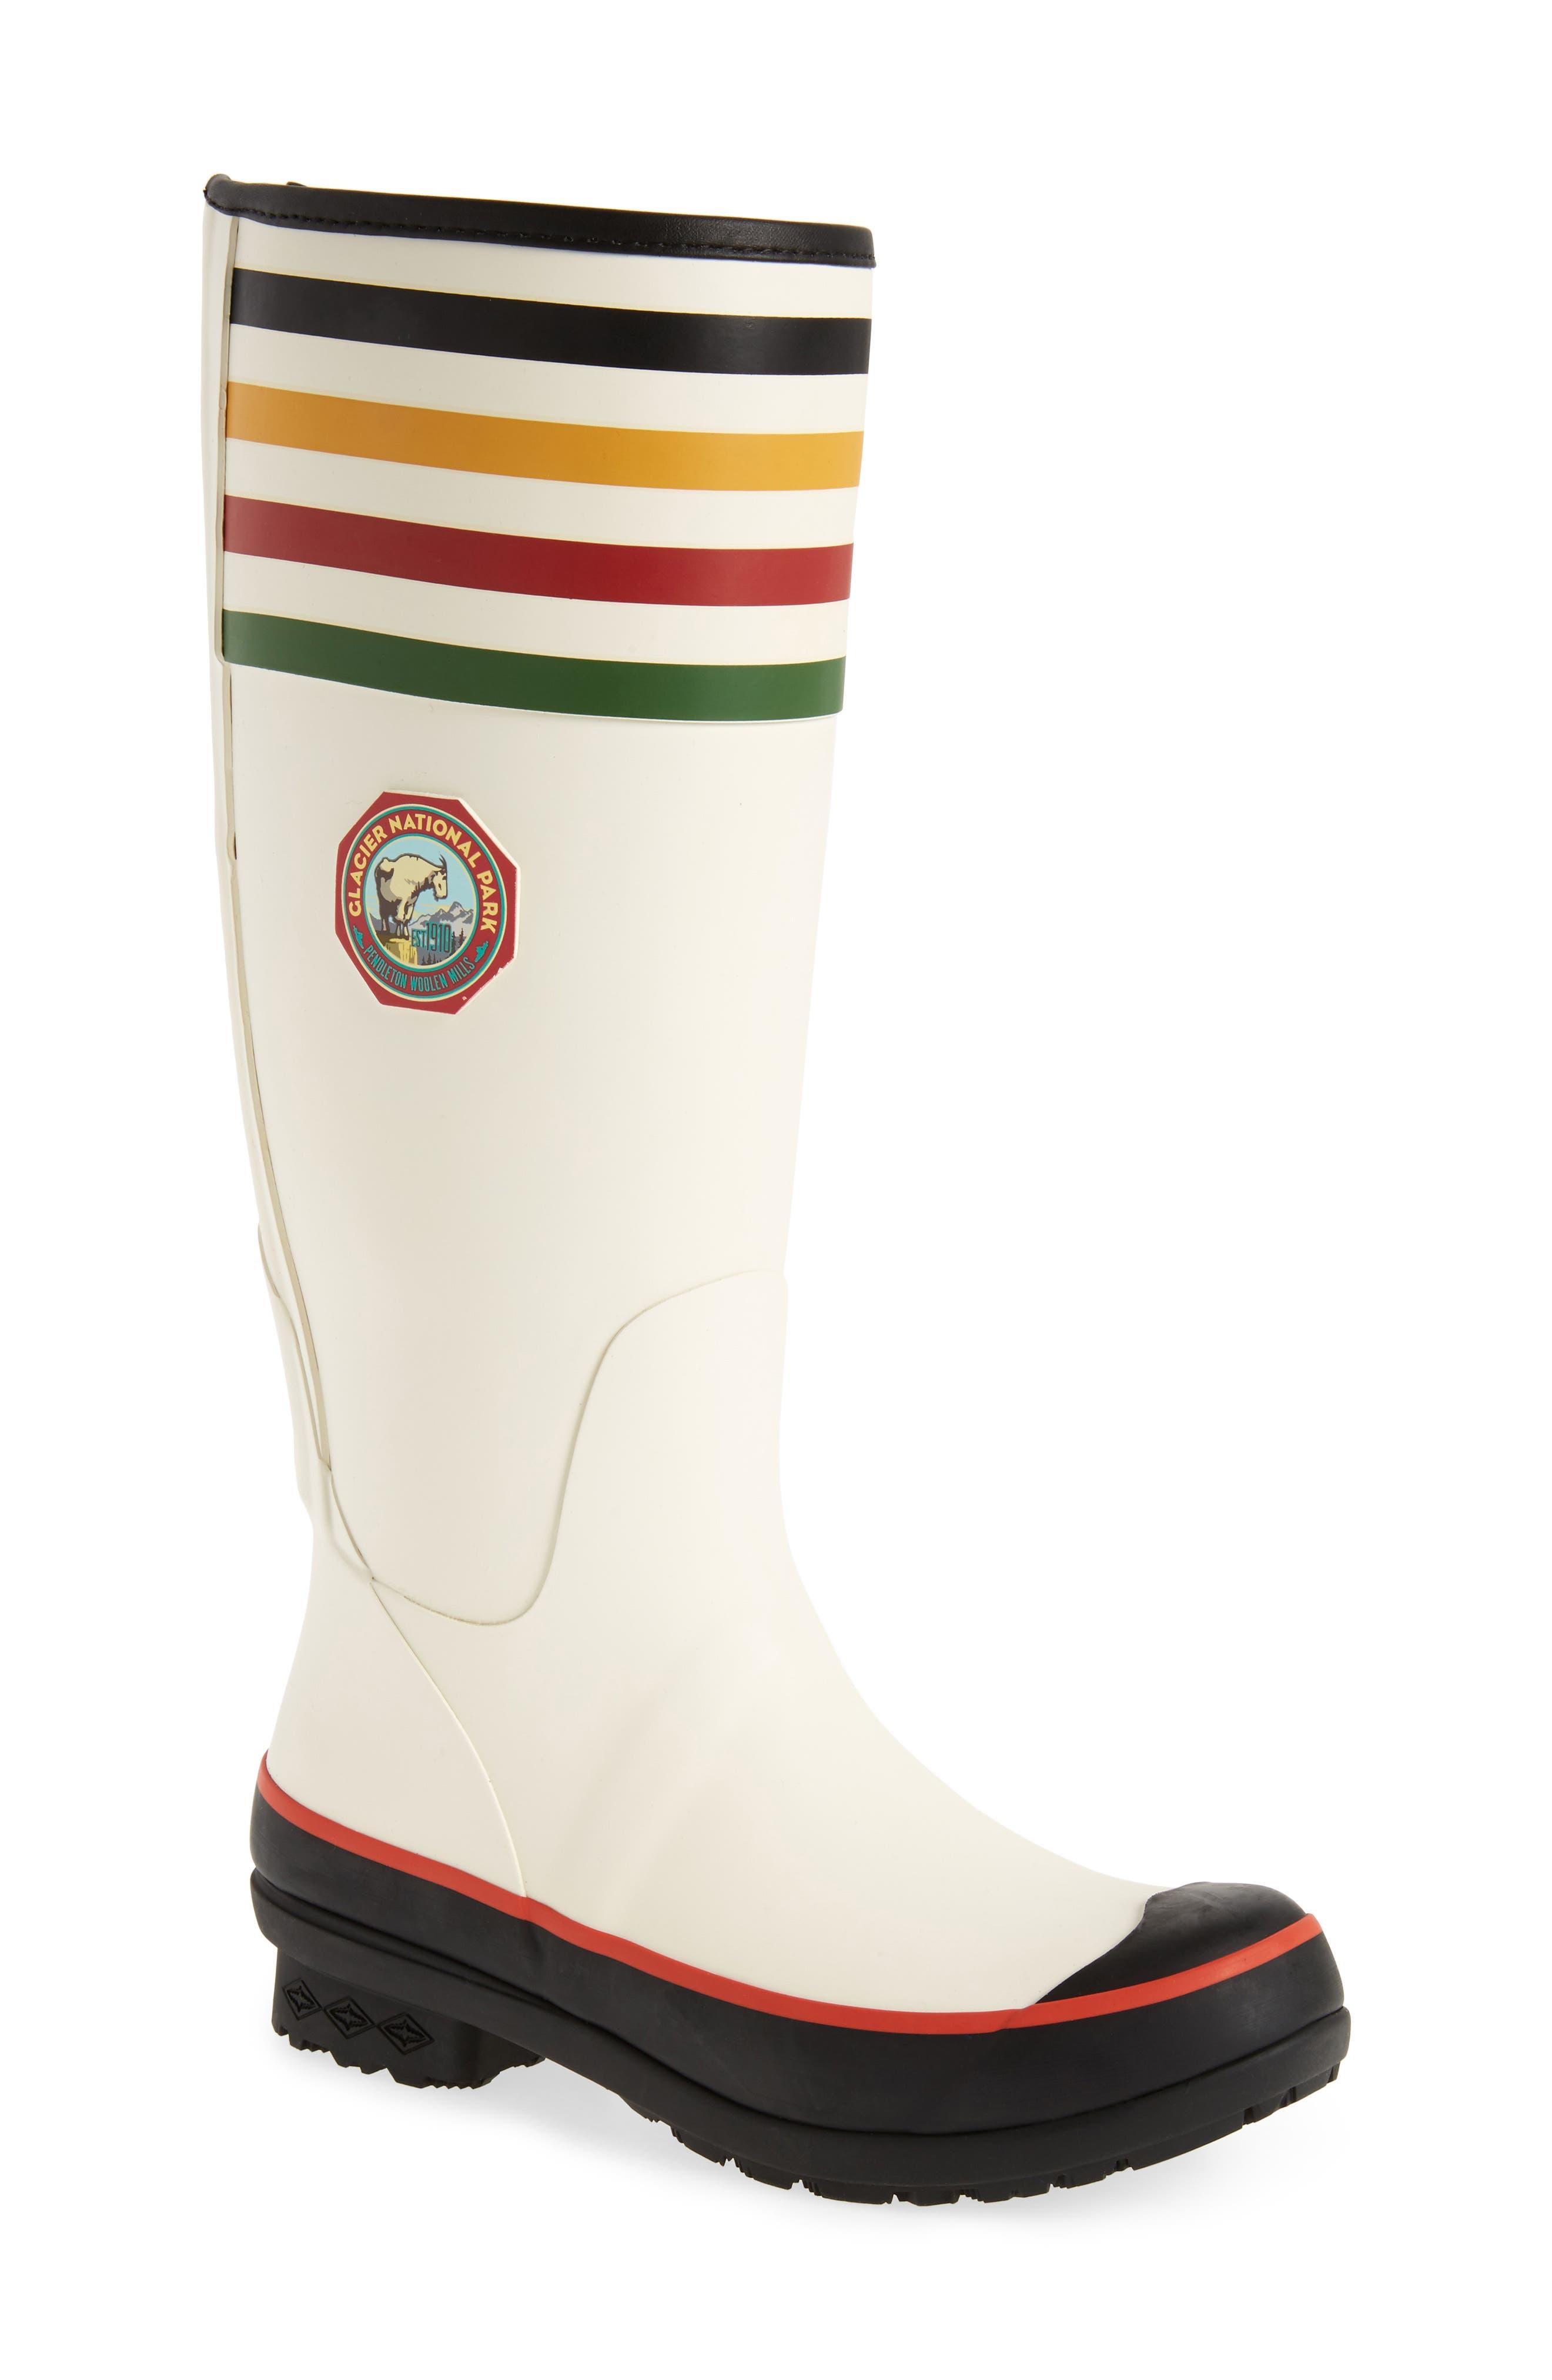 Main Image - Pendleton Glacier National Park Tall Rain Boot (Women)